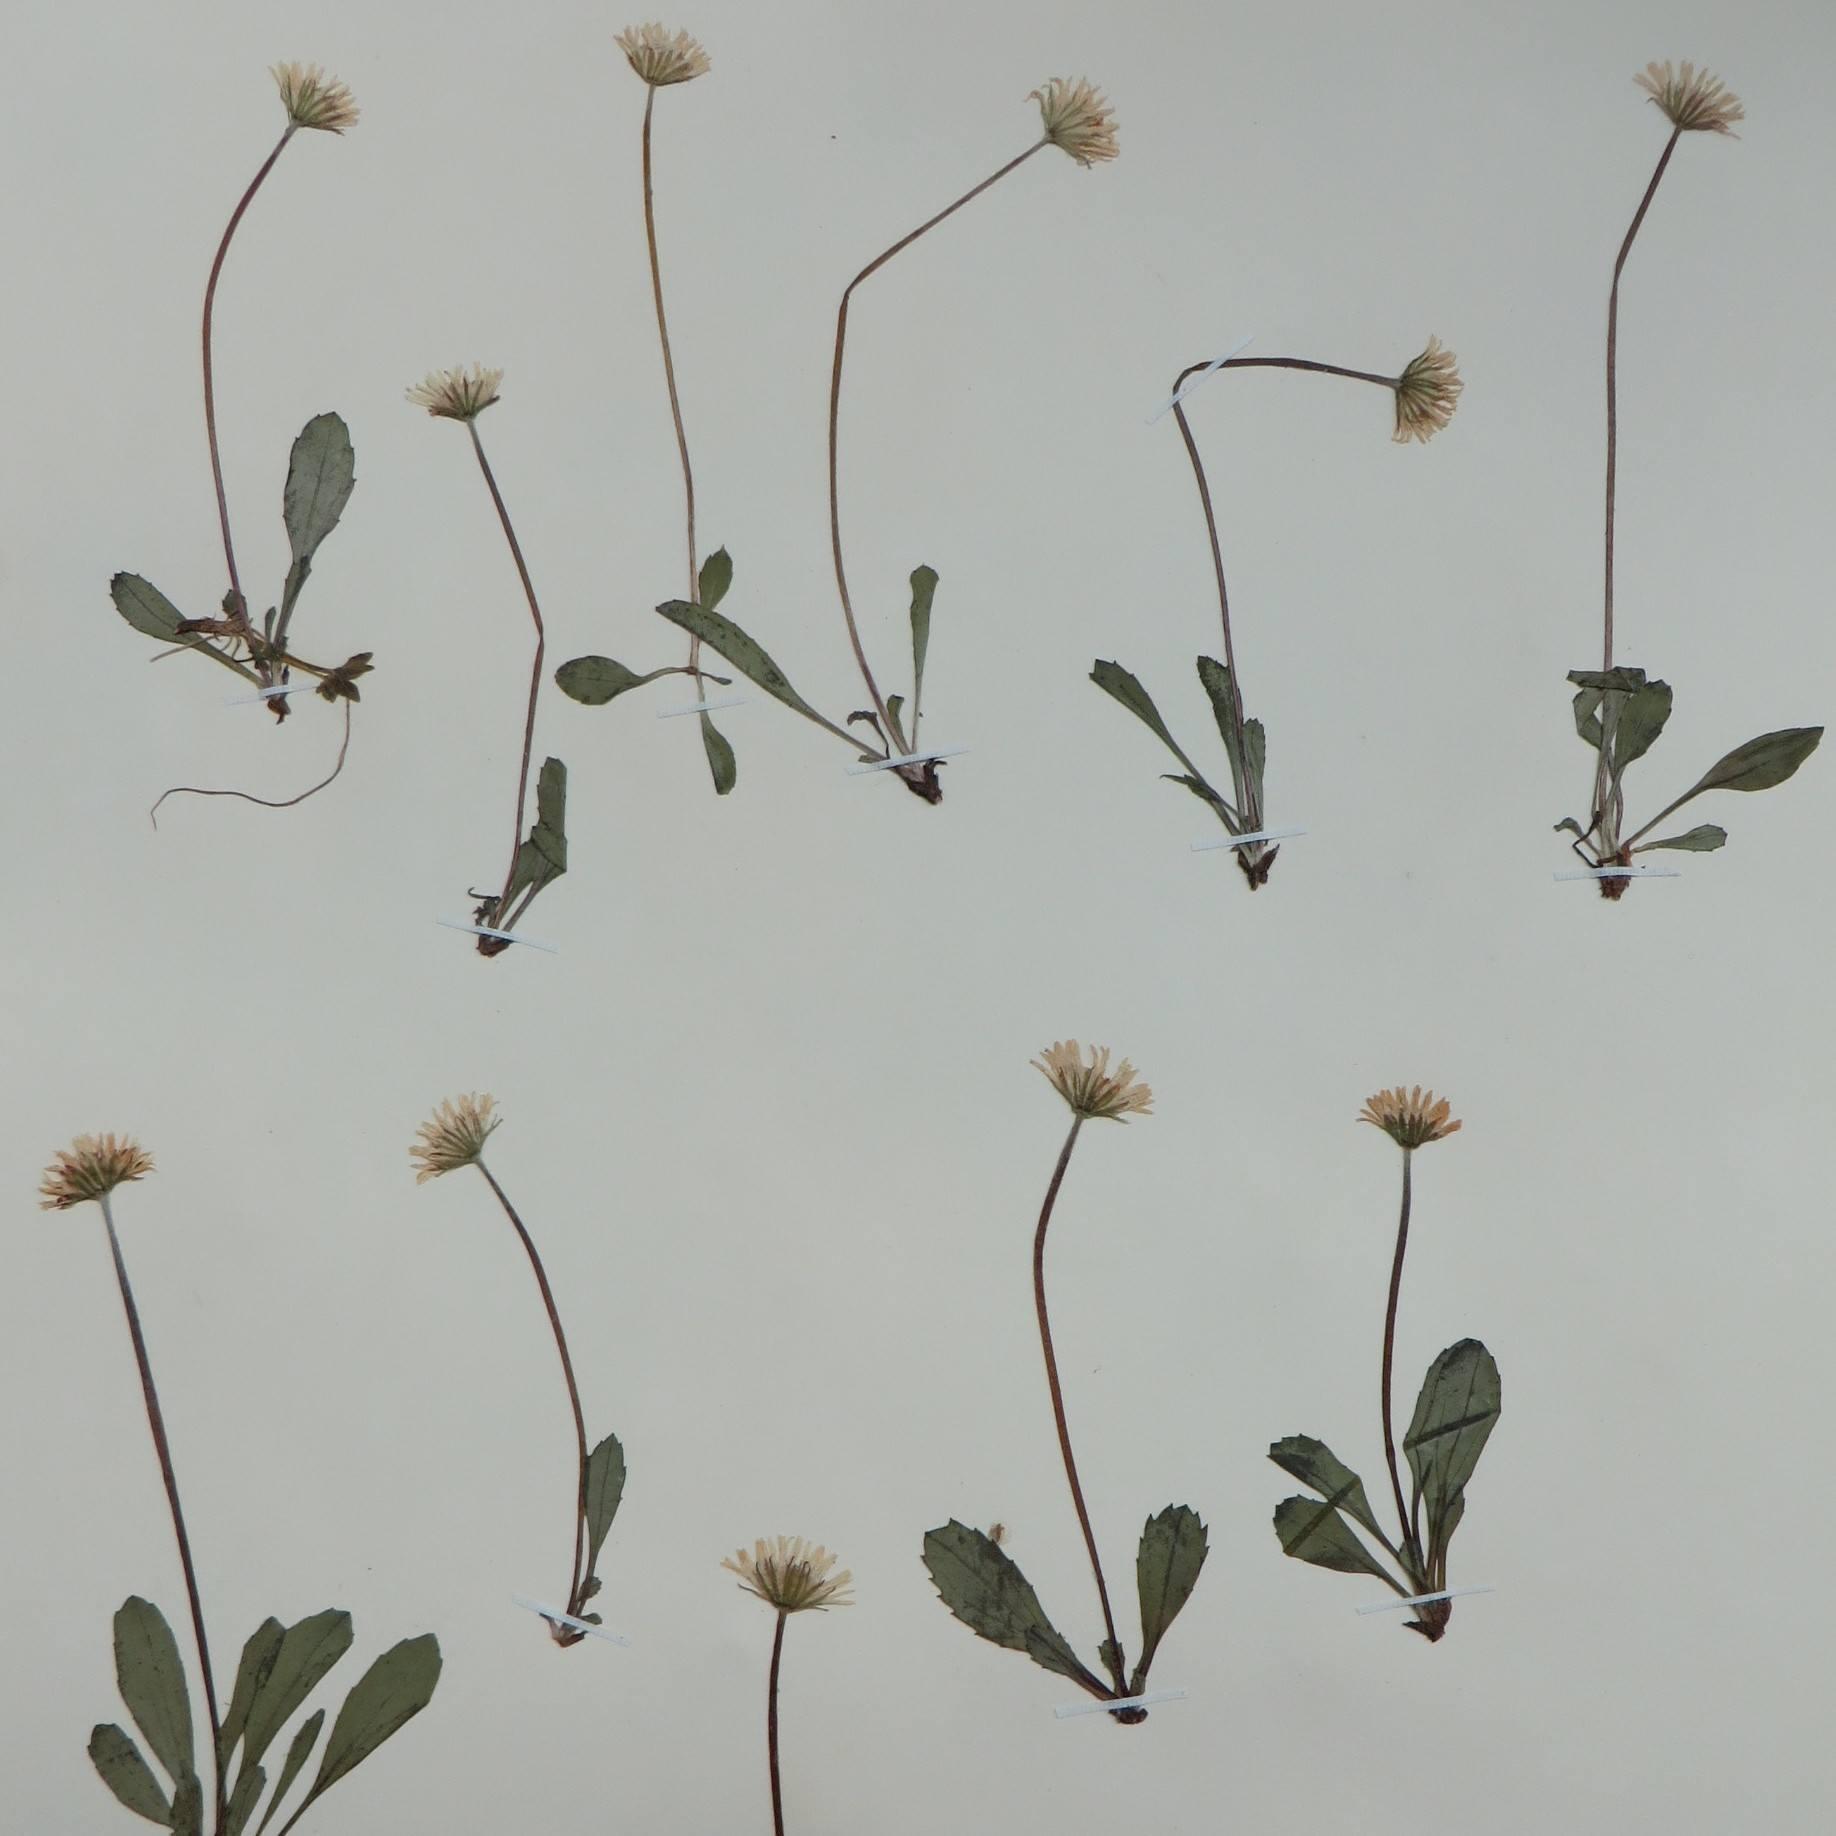 herbarium daisy sheet nhm